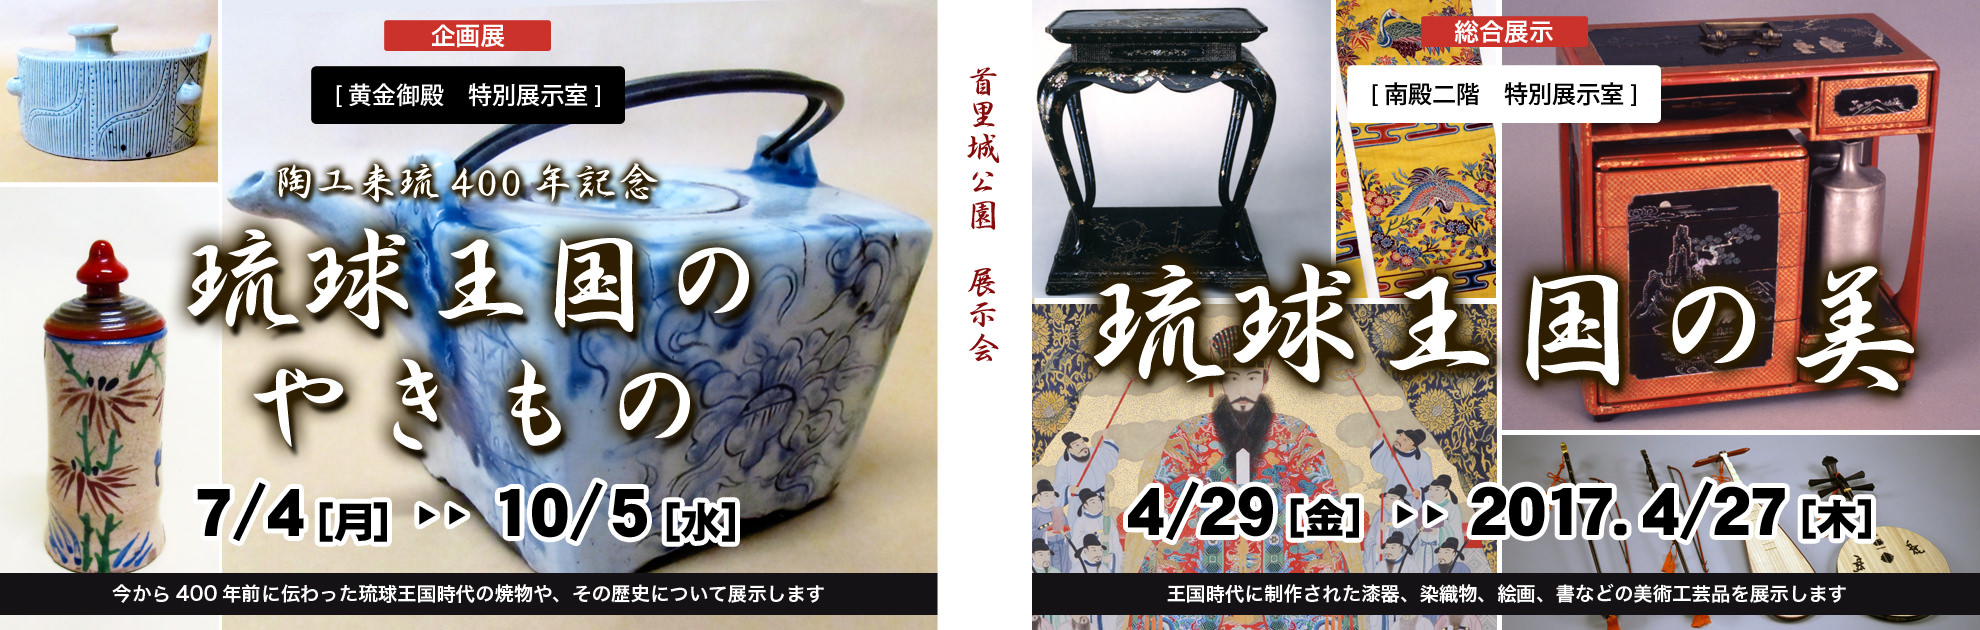 Shurijo Castle Park exhibition